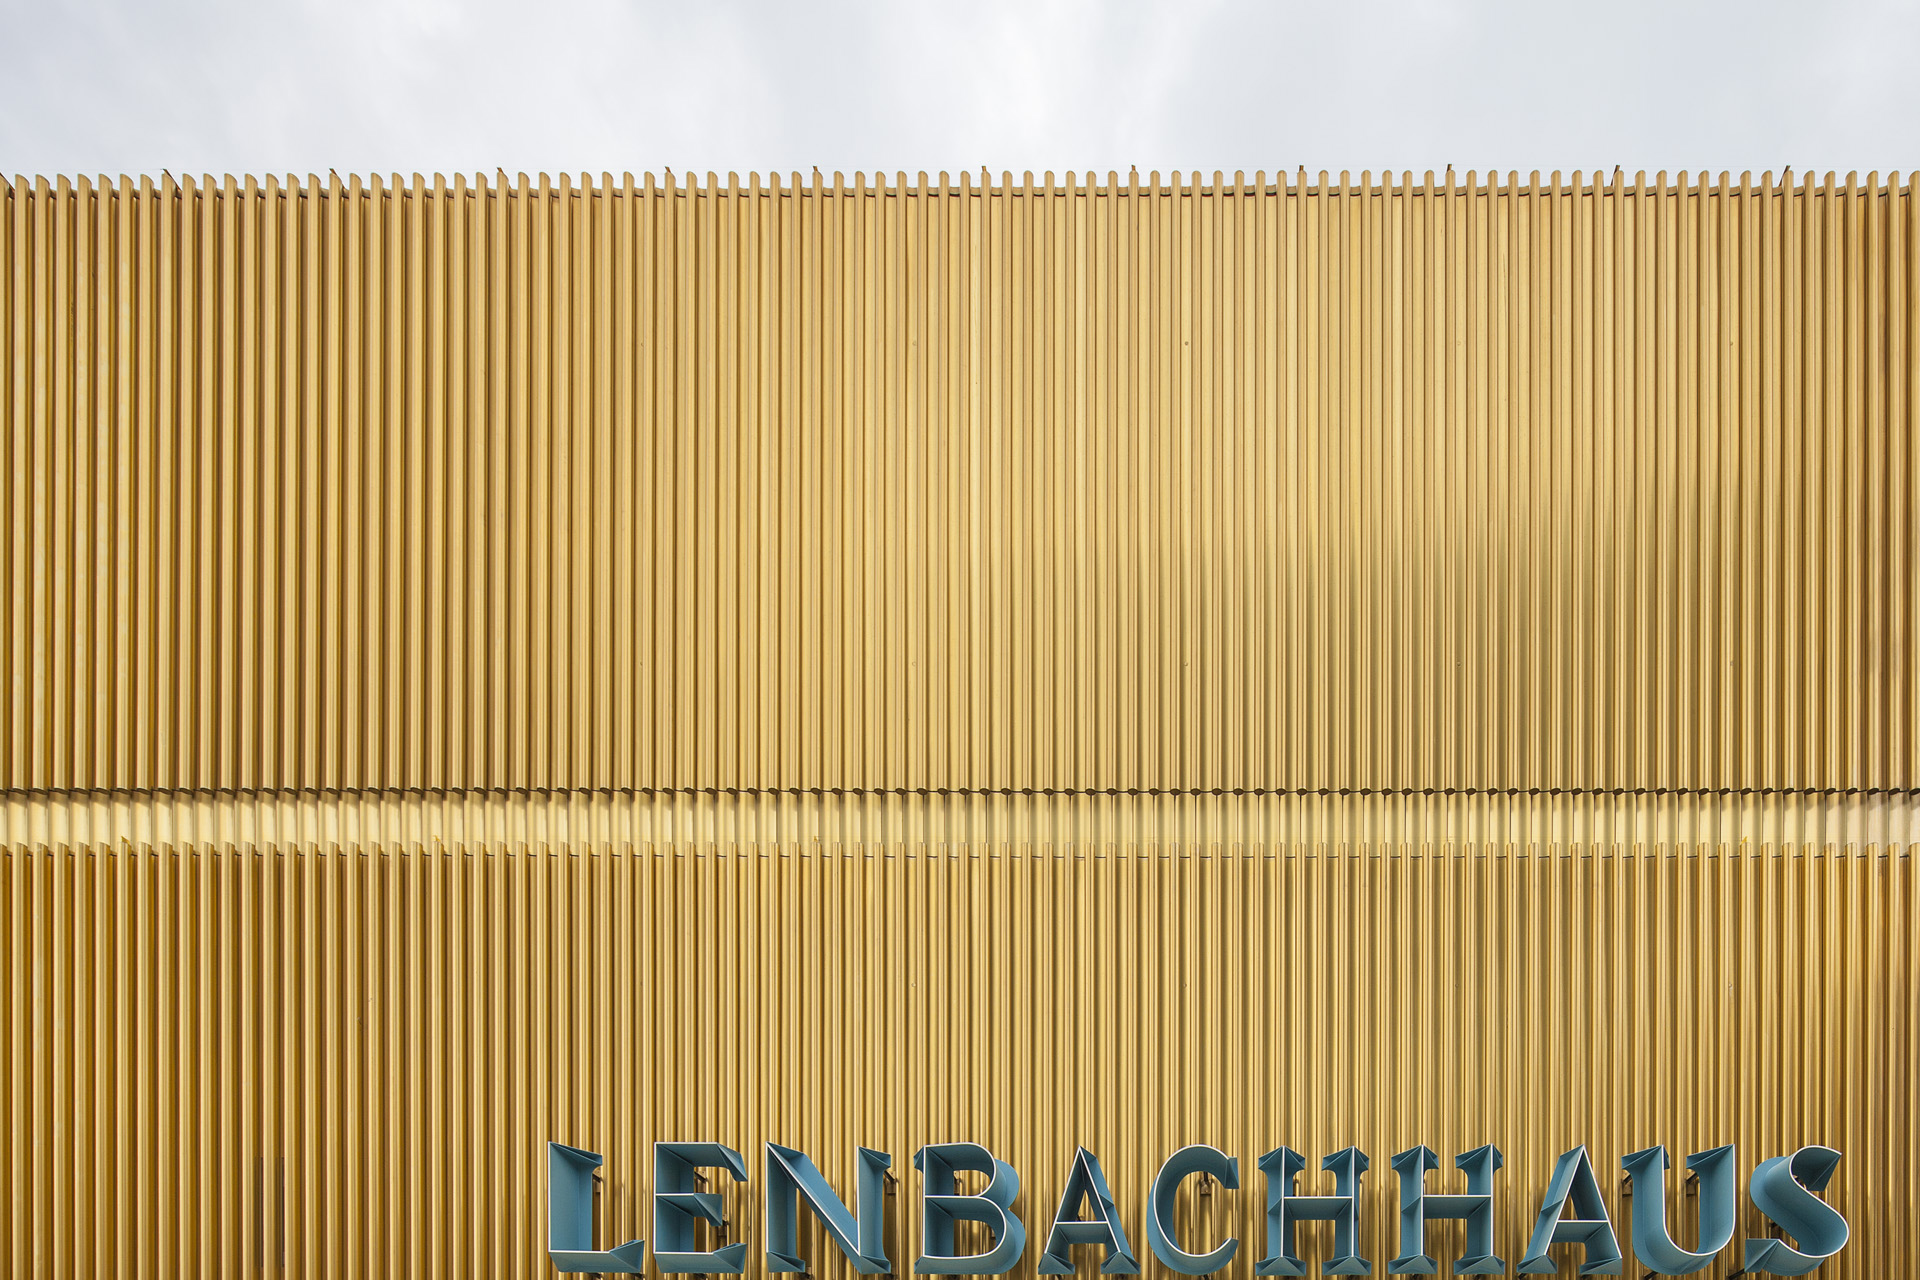 MG 0044 - Lenbachhaus München